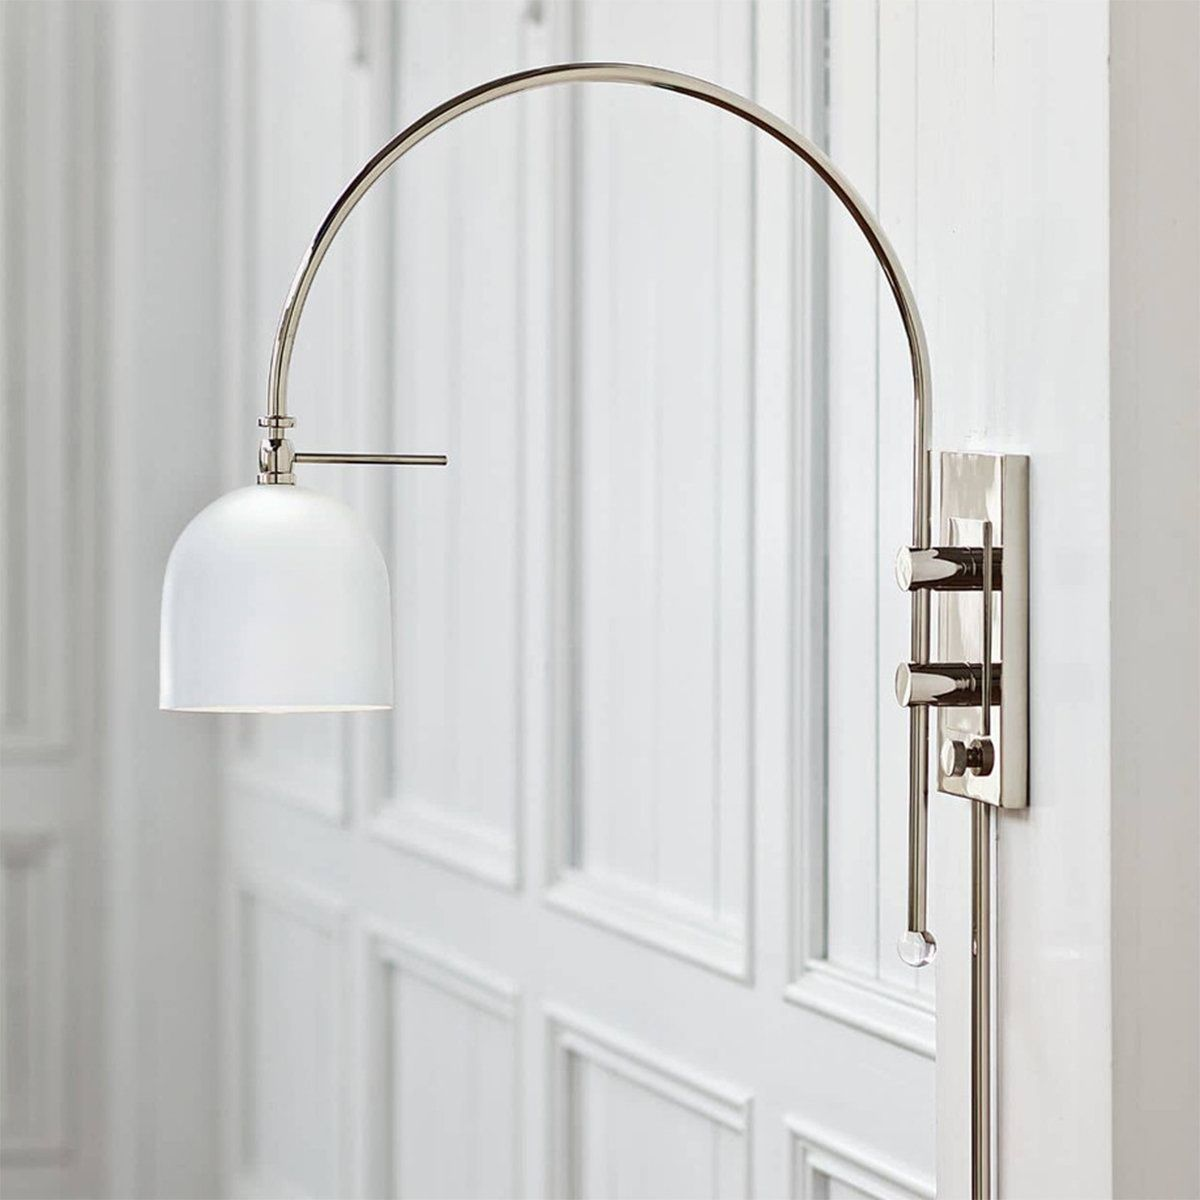 Arc Dome White Shade Modern Swing Arm Wall Light In 2021 Swing Arm Wall Lamps Swing Arm Wall Light Wall Light Shades